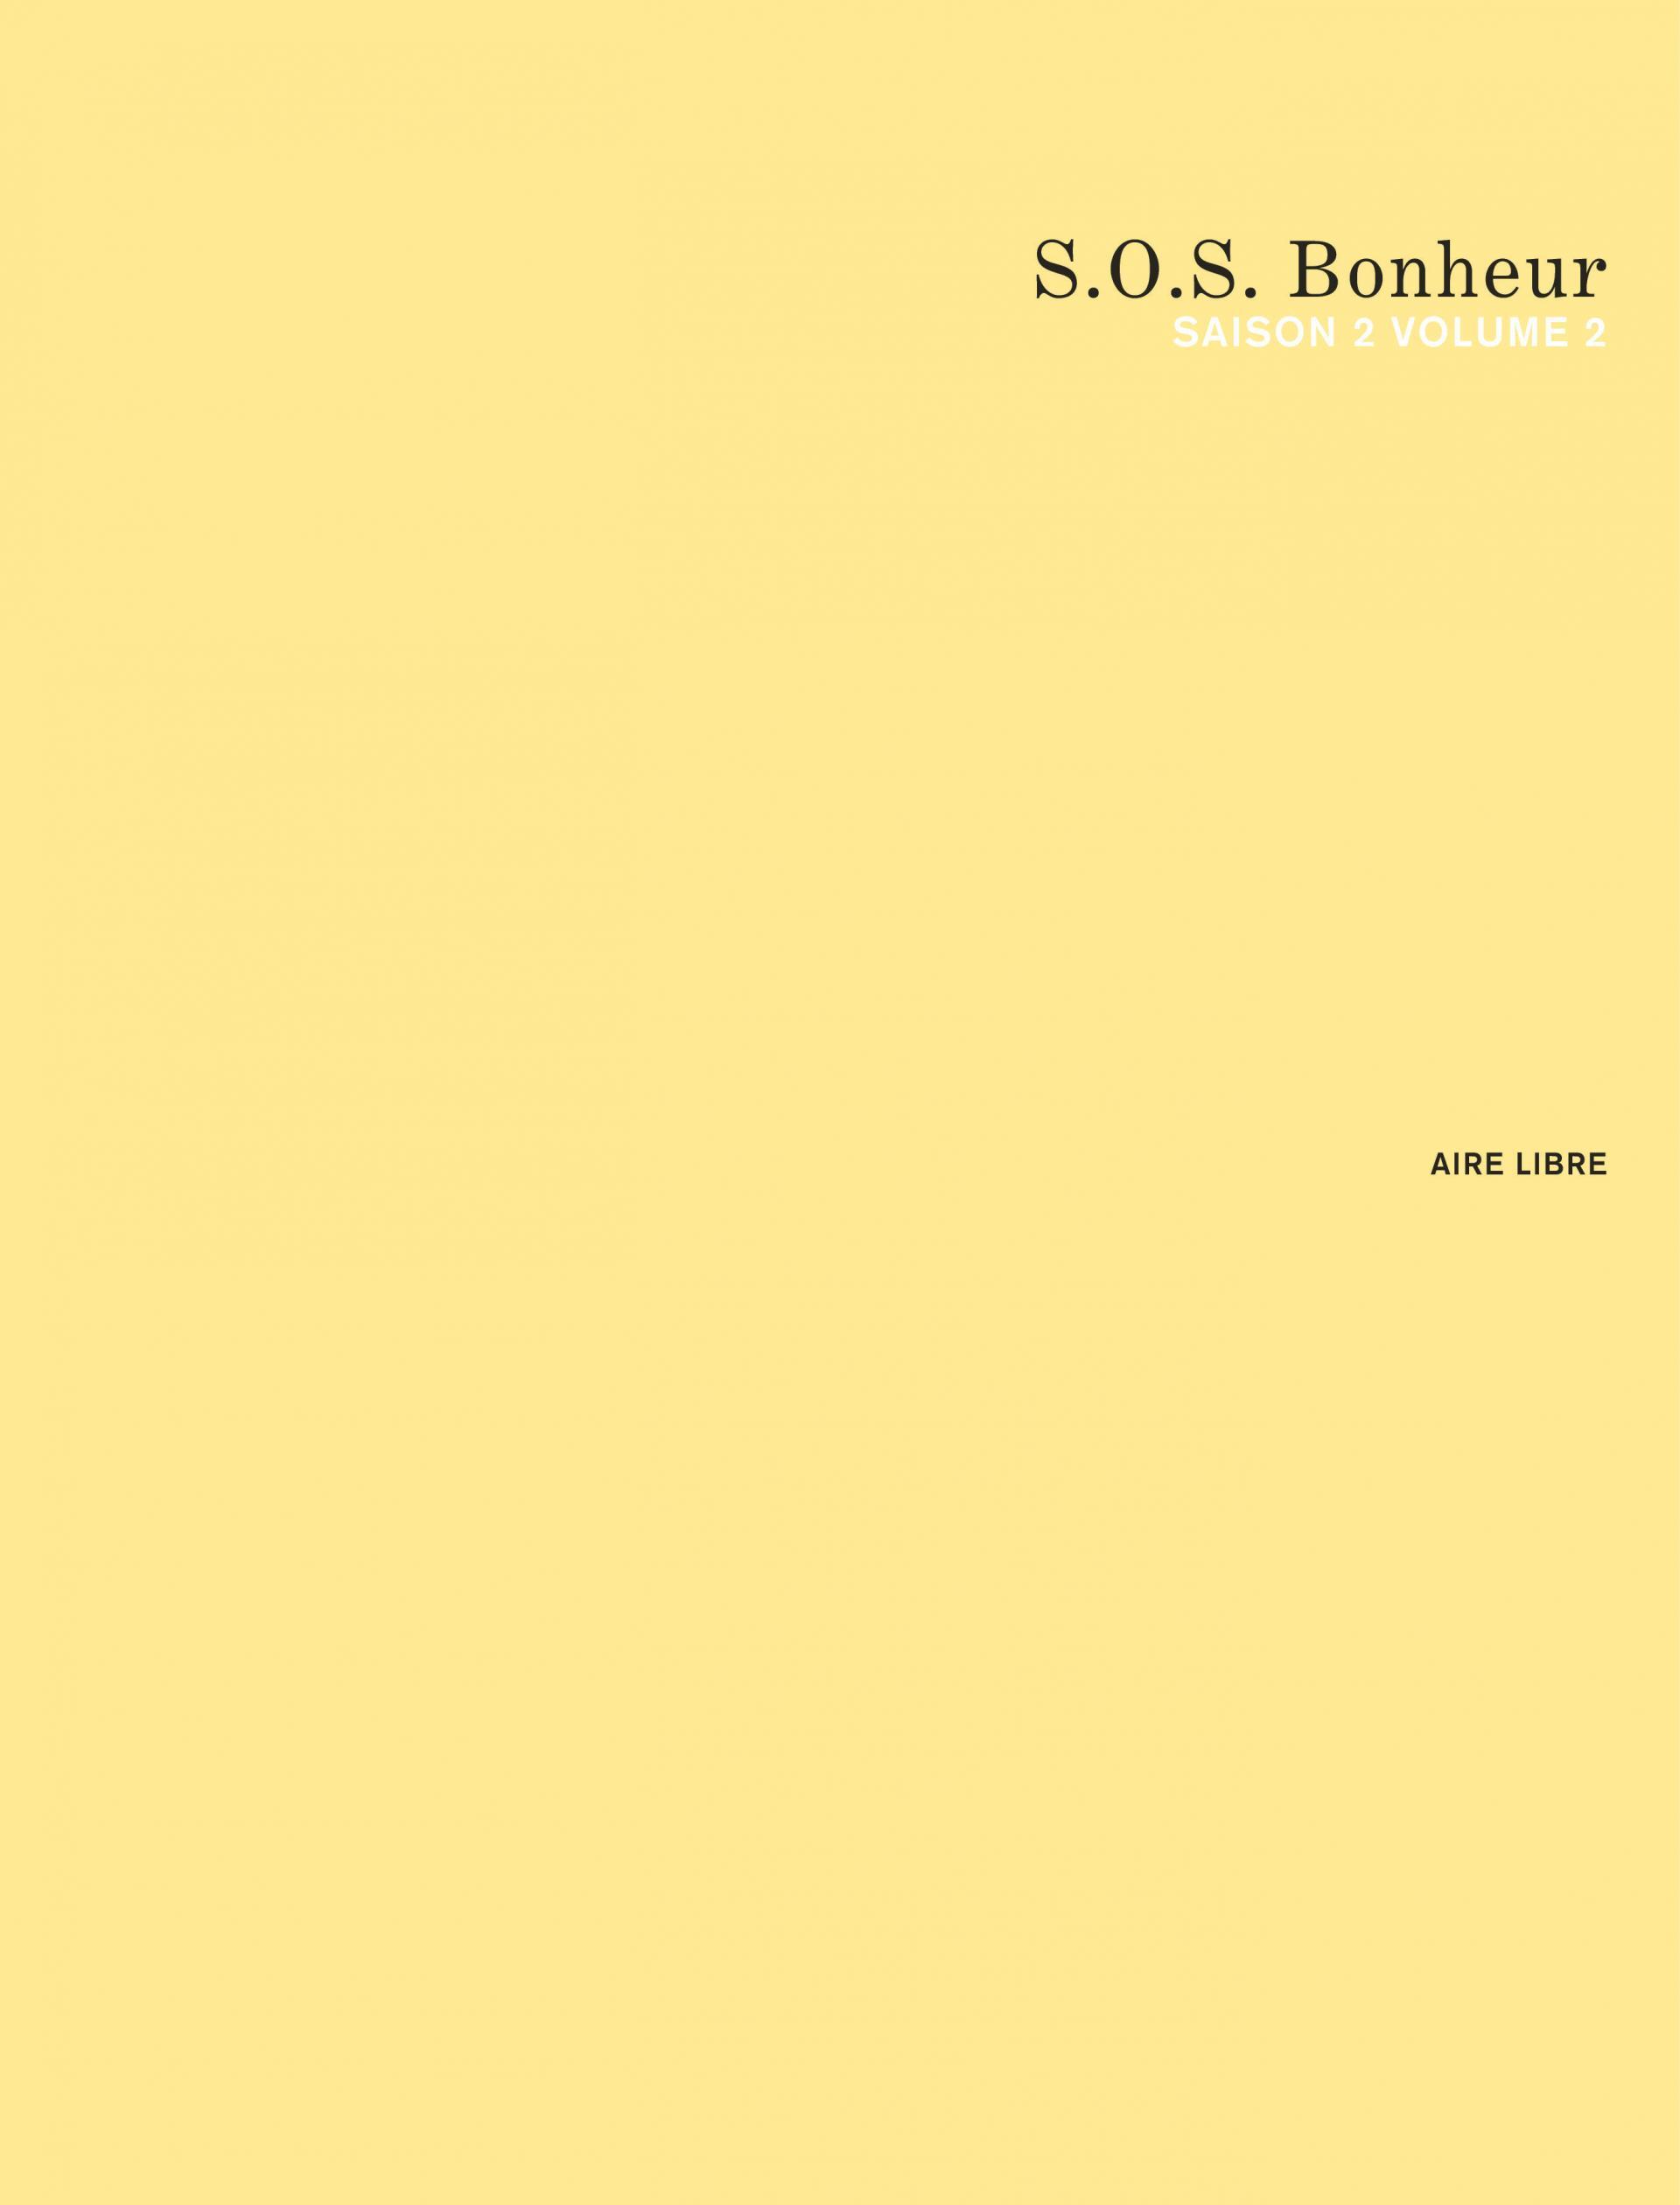 S.O.S. Bonheur Saison 2 2/2